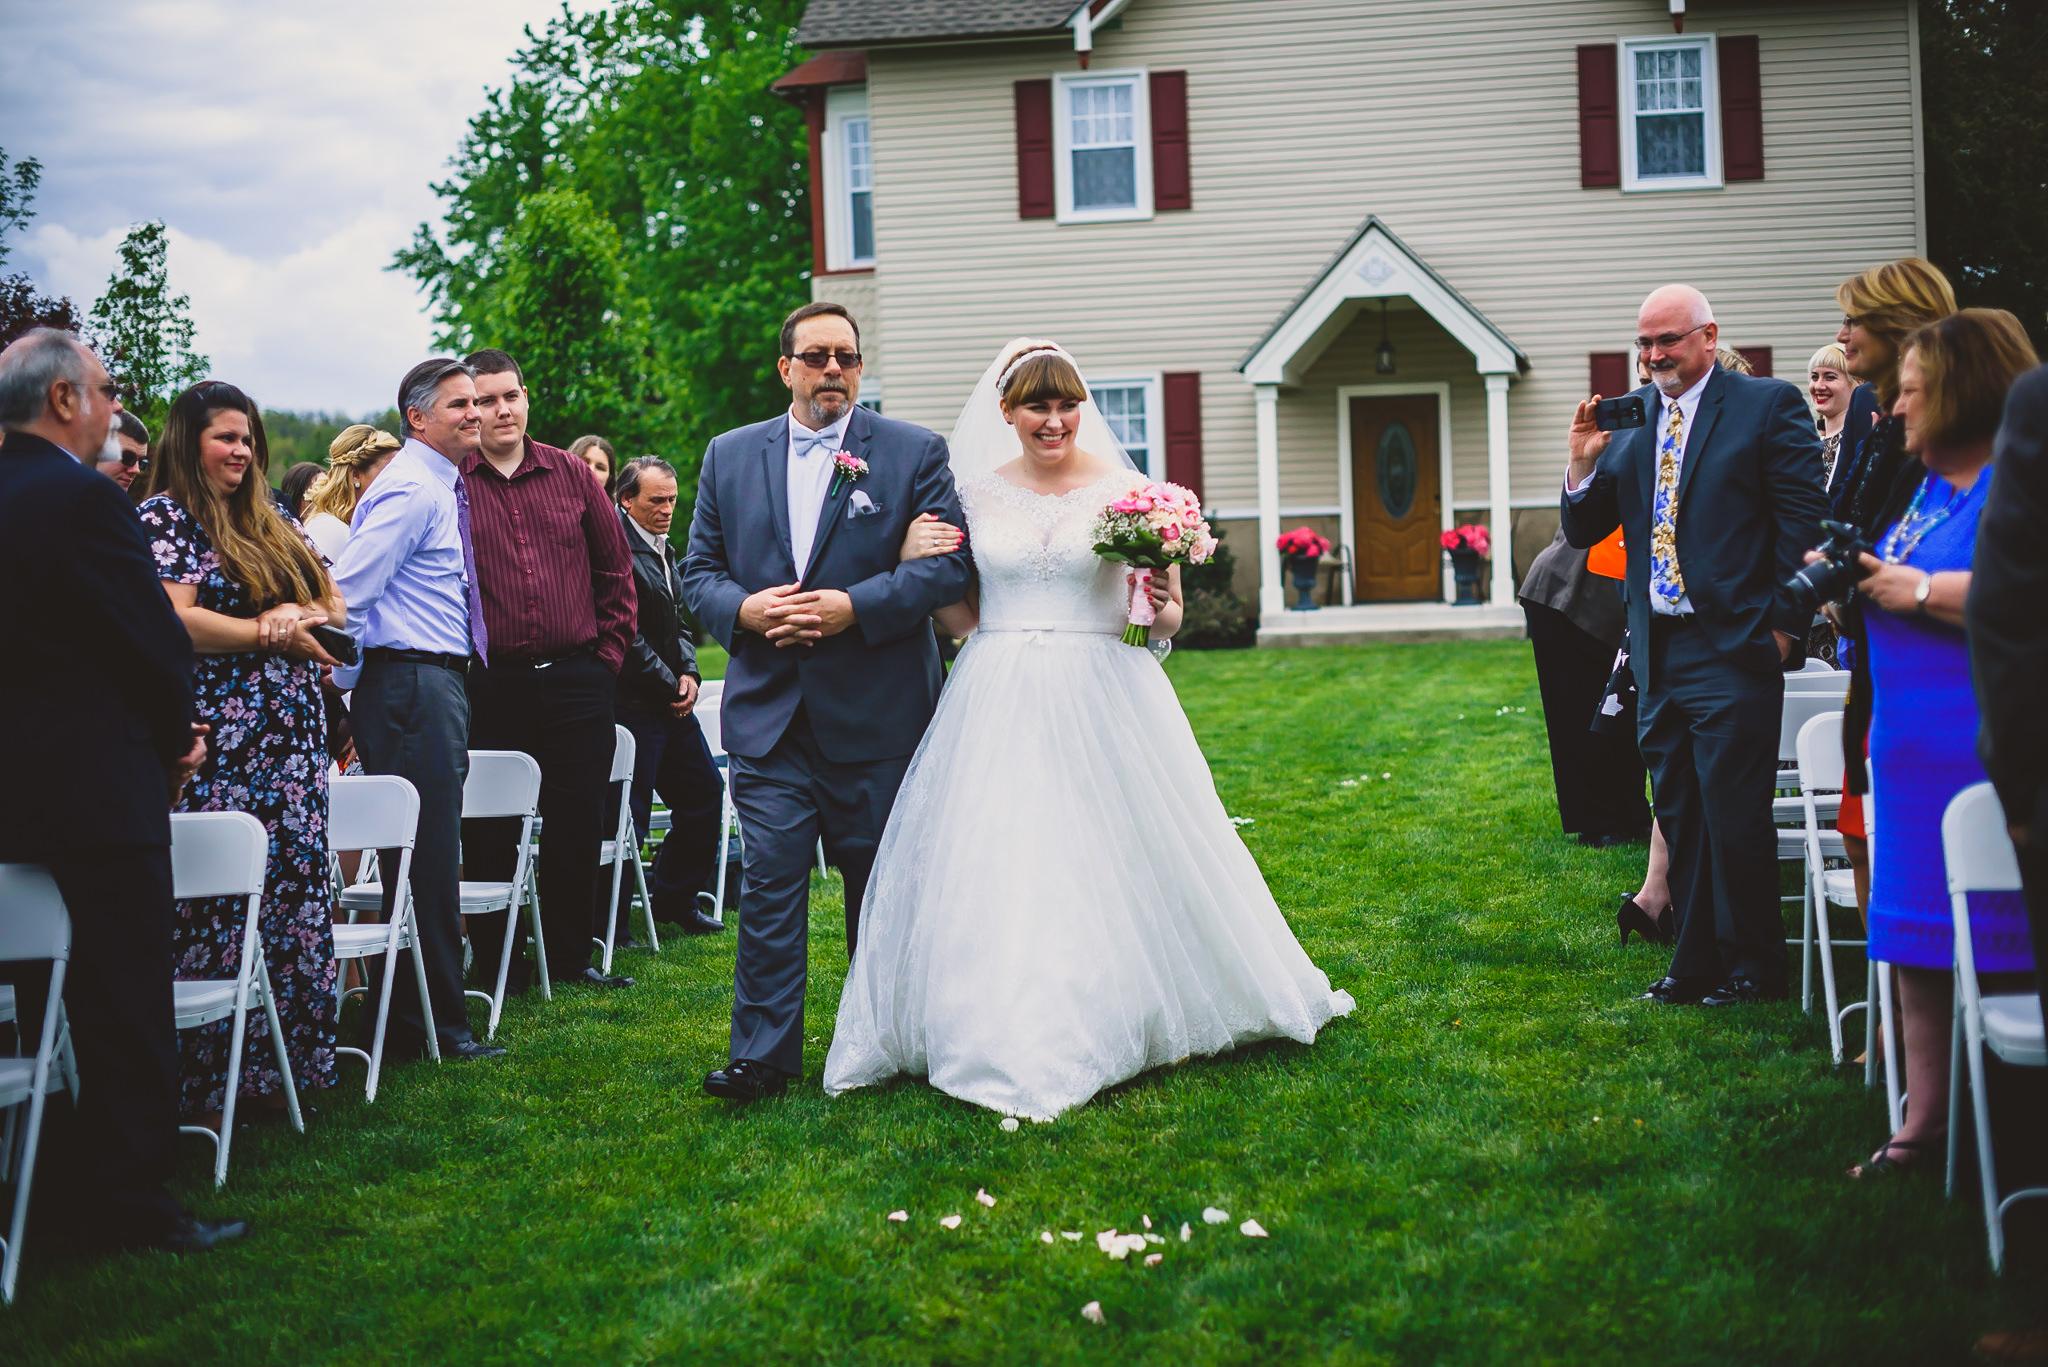 Wedding at Warrington Country Club